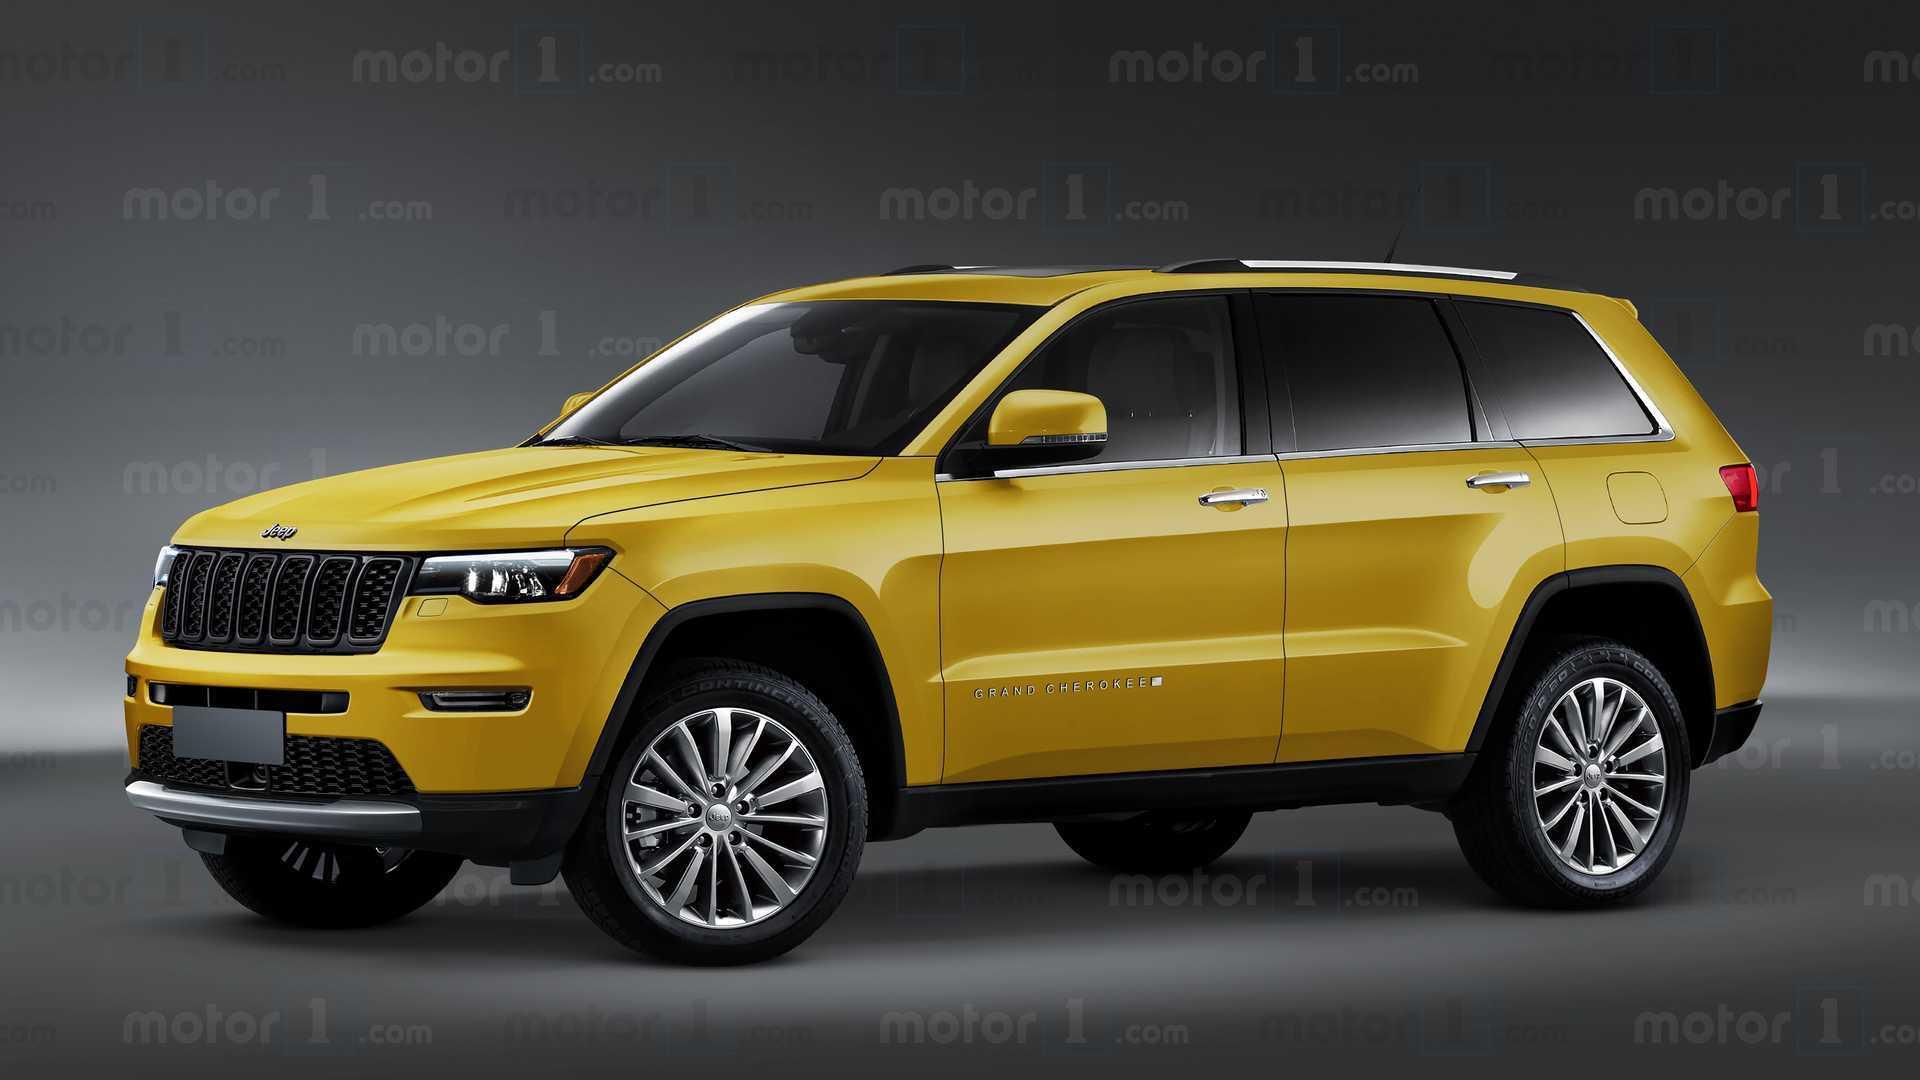 Novo Jeep Grand Cherokee 2022 Projecao Adianta Design Da Proxima Geracao